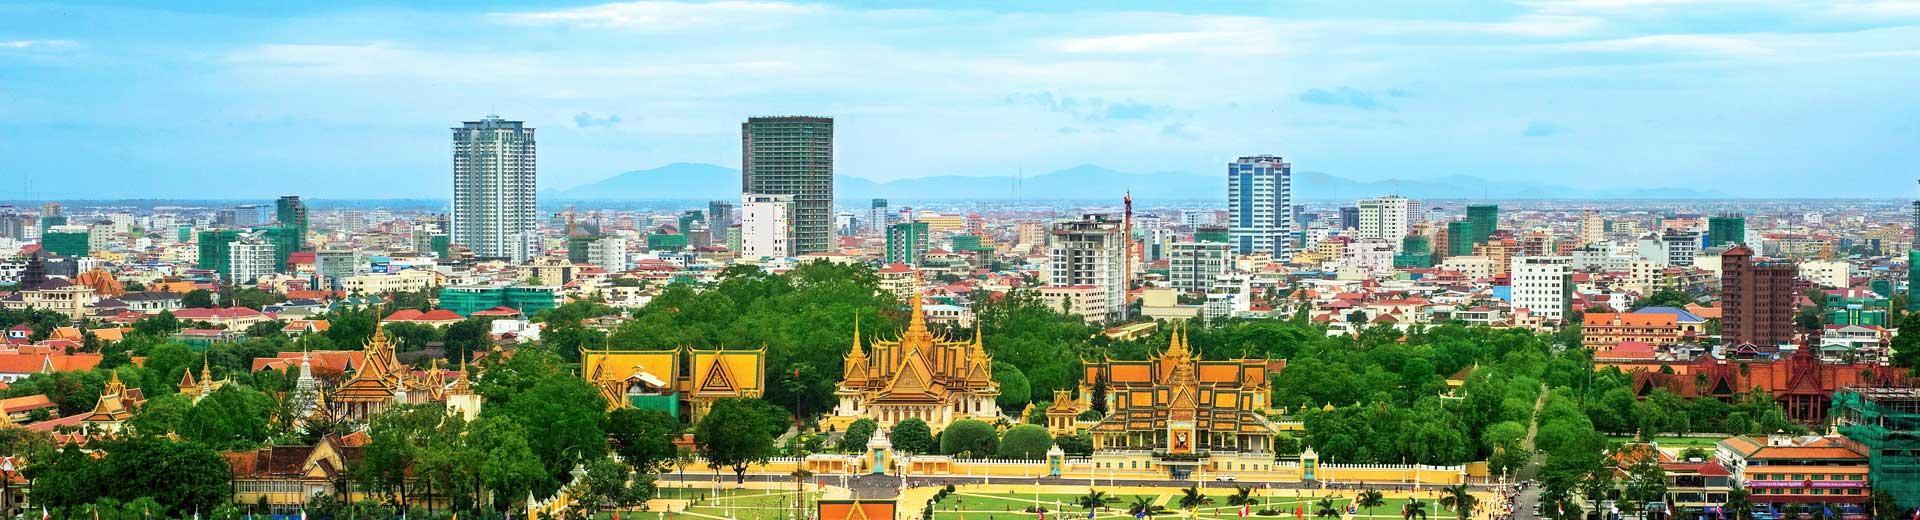 Alpha International Corporation Ltd  | Phnom Penh Kingdom of Cambodia